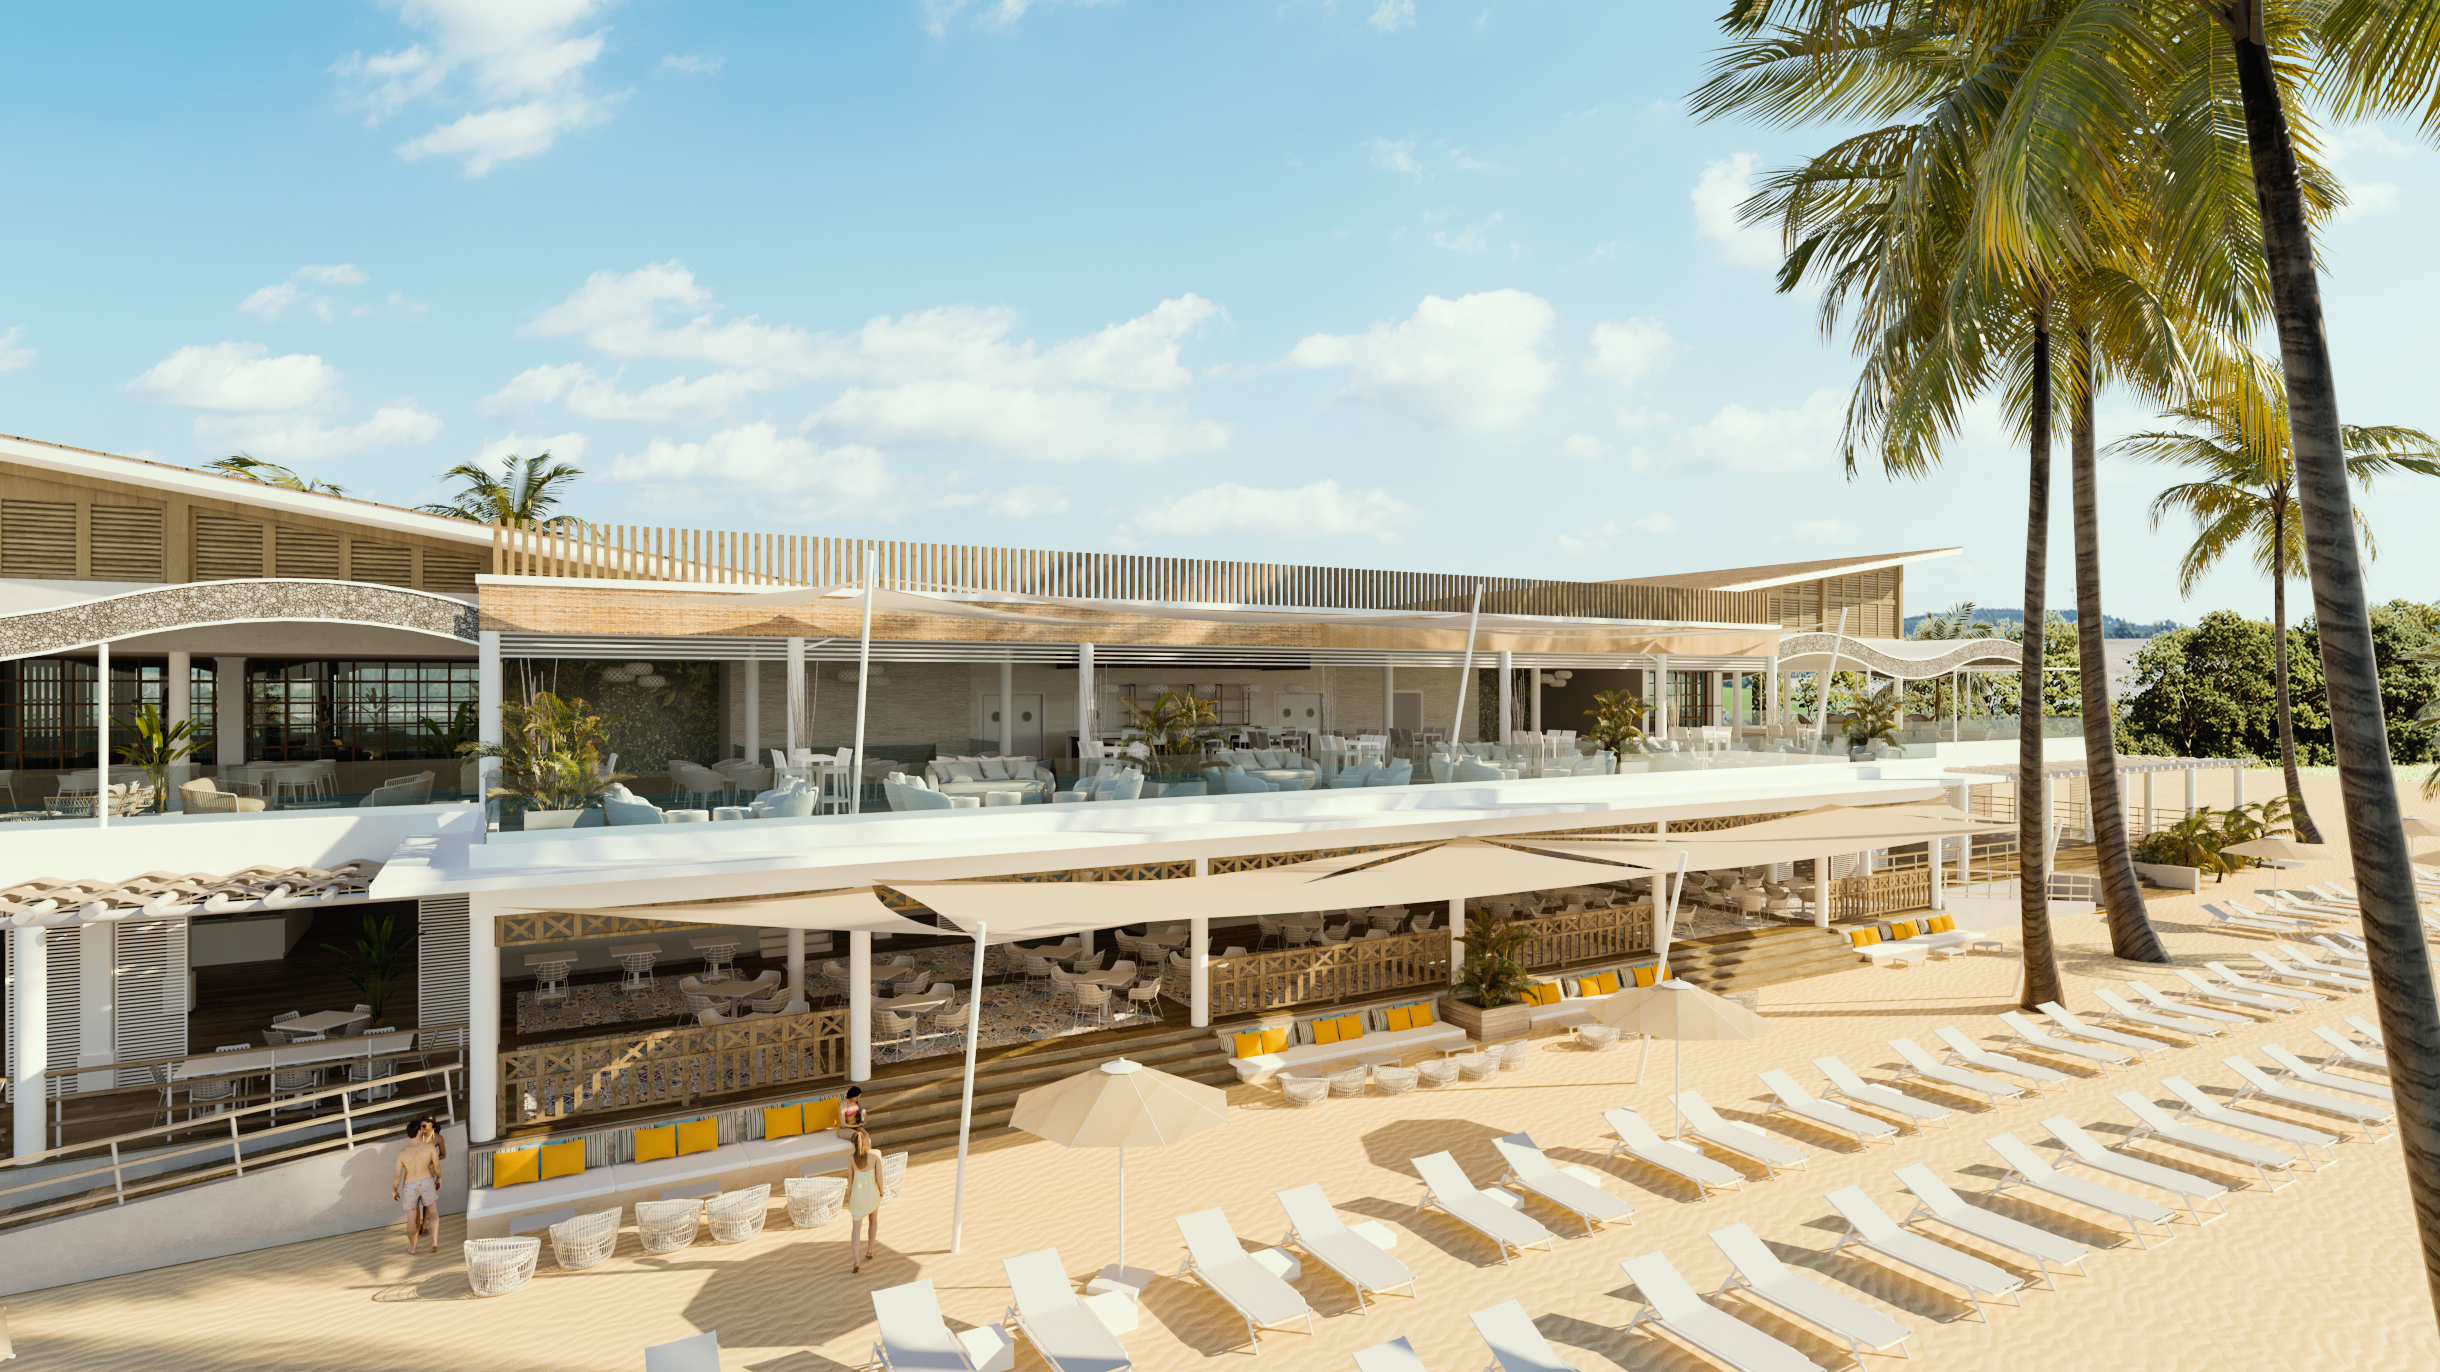 New Beach Club in Punta Cana